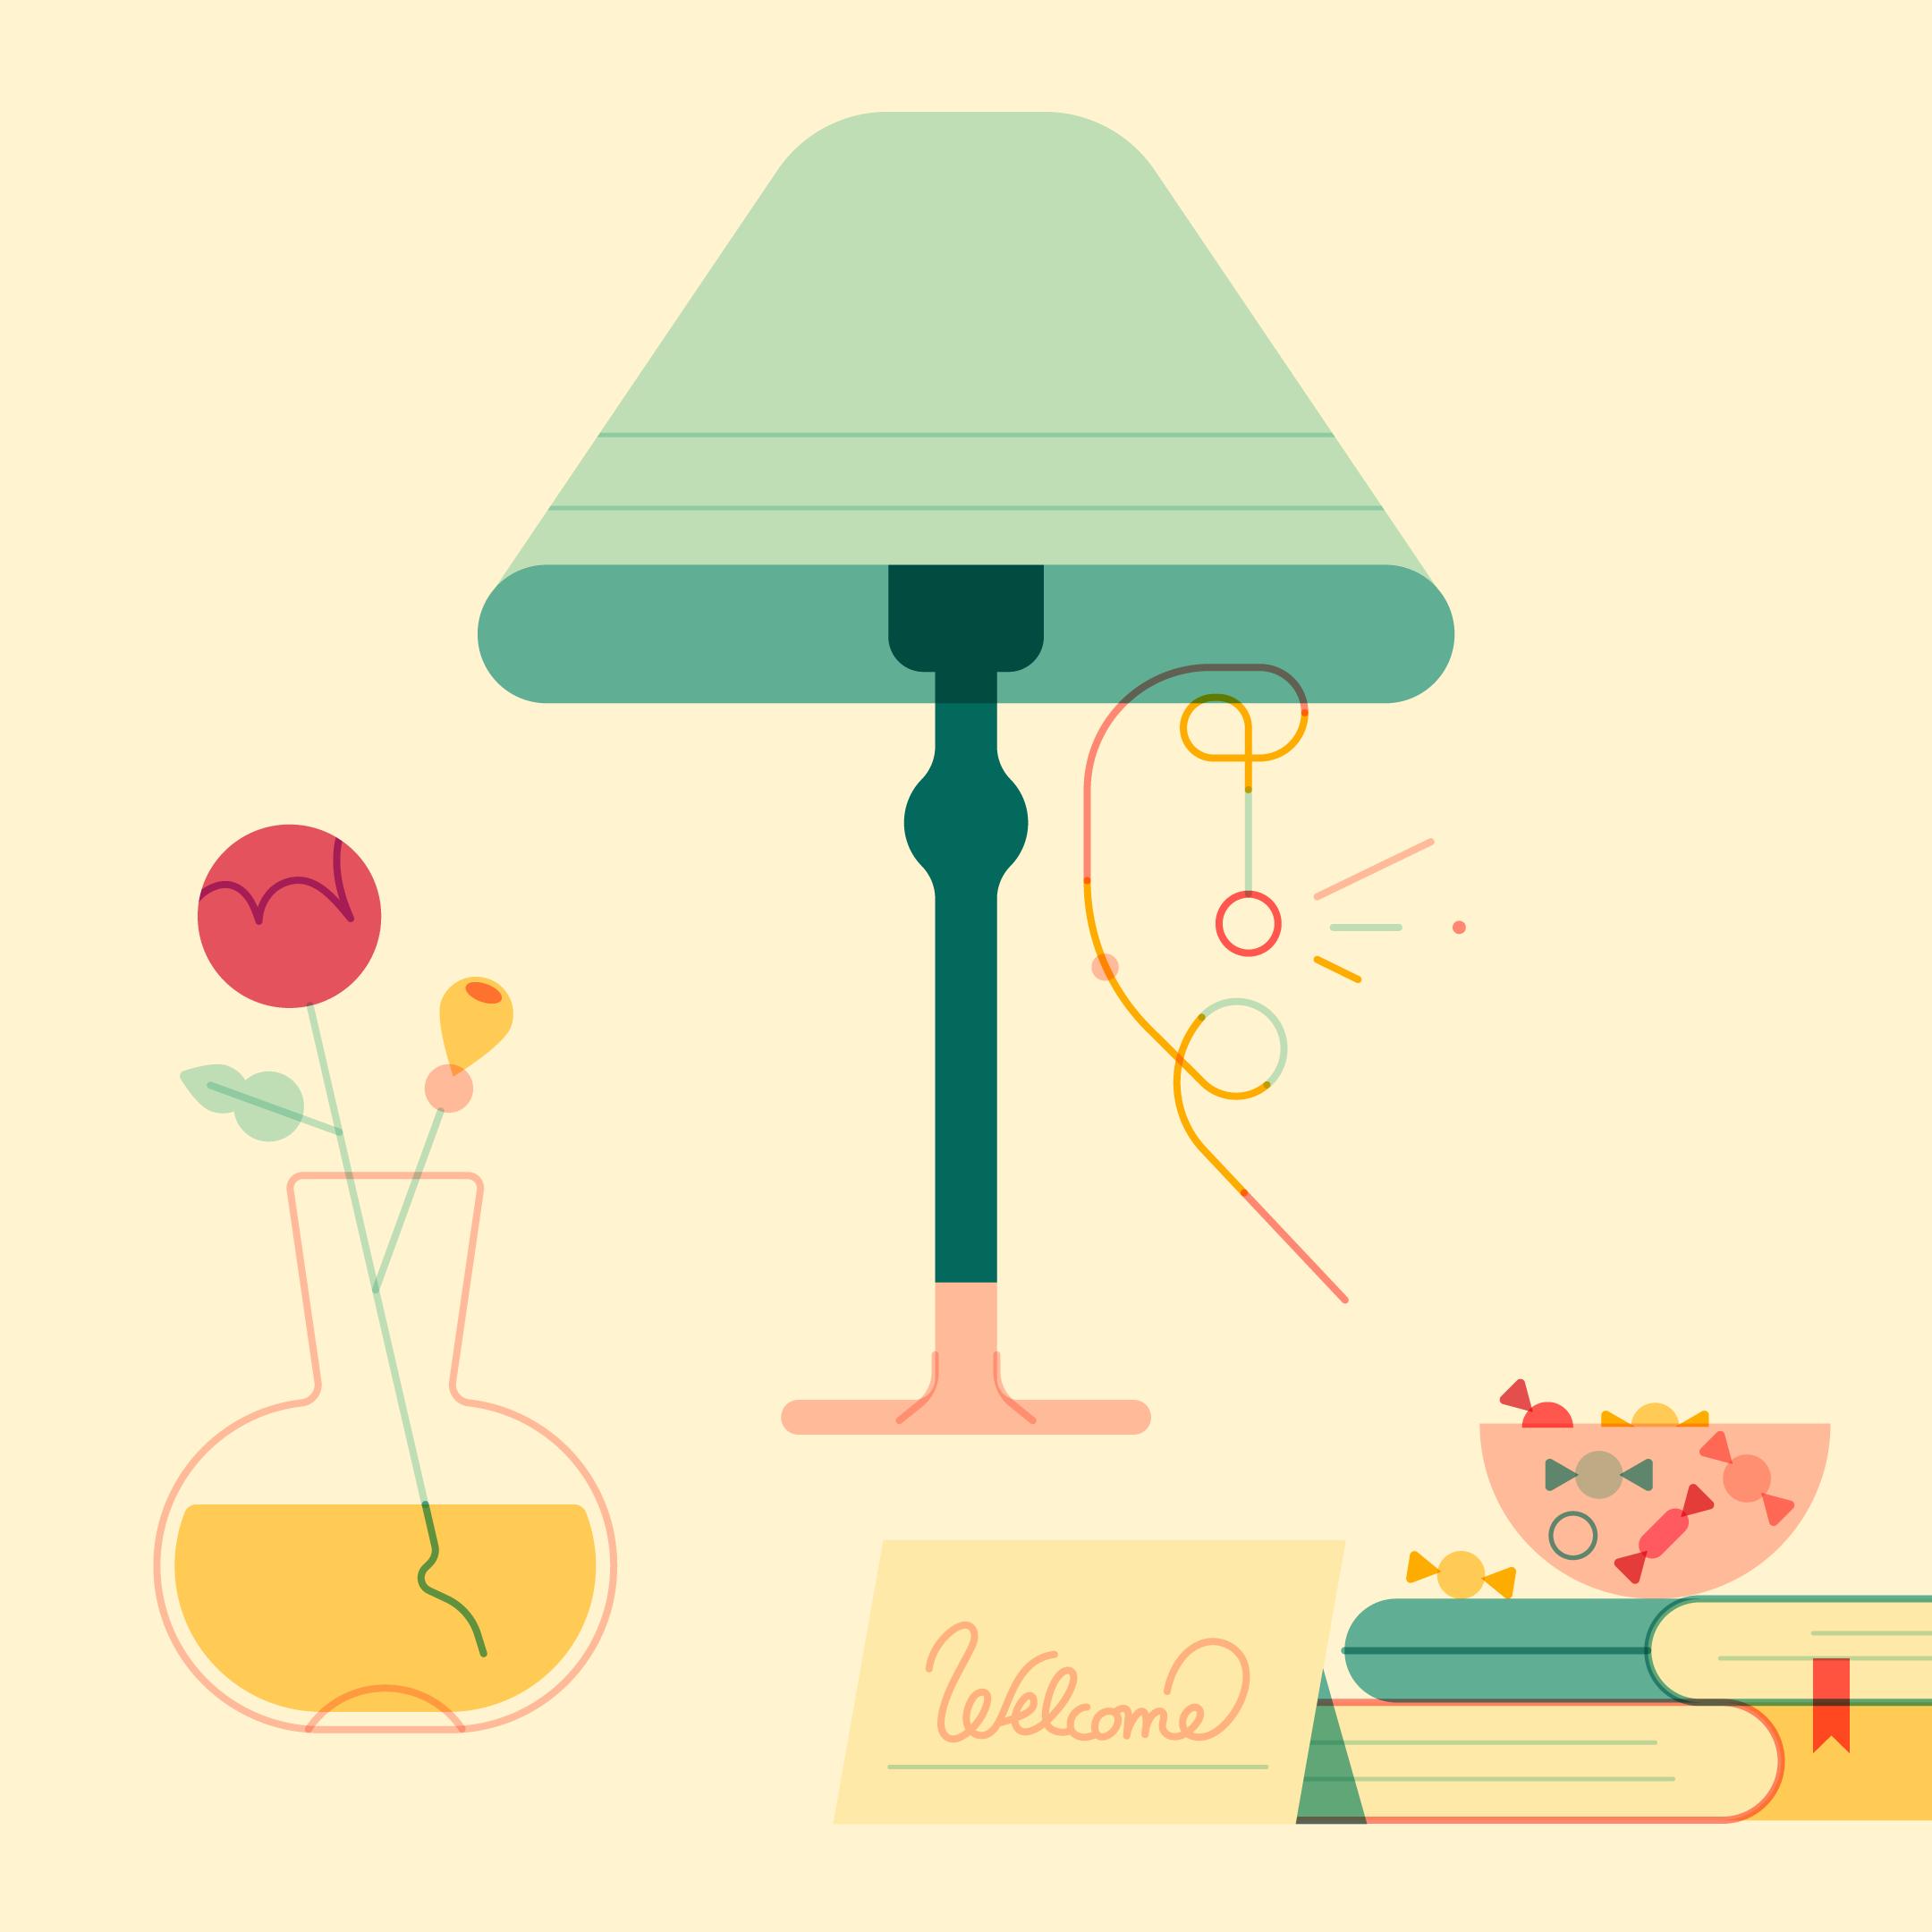 lorisalessandria_airbnb_SH08.png